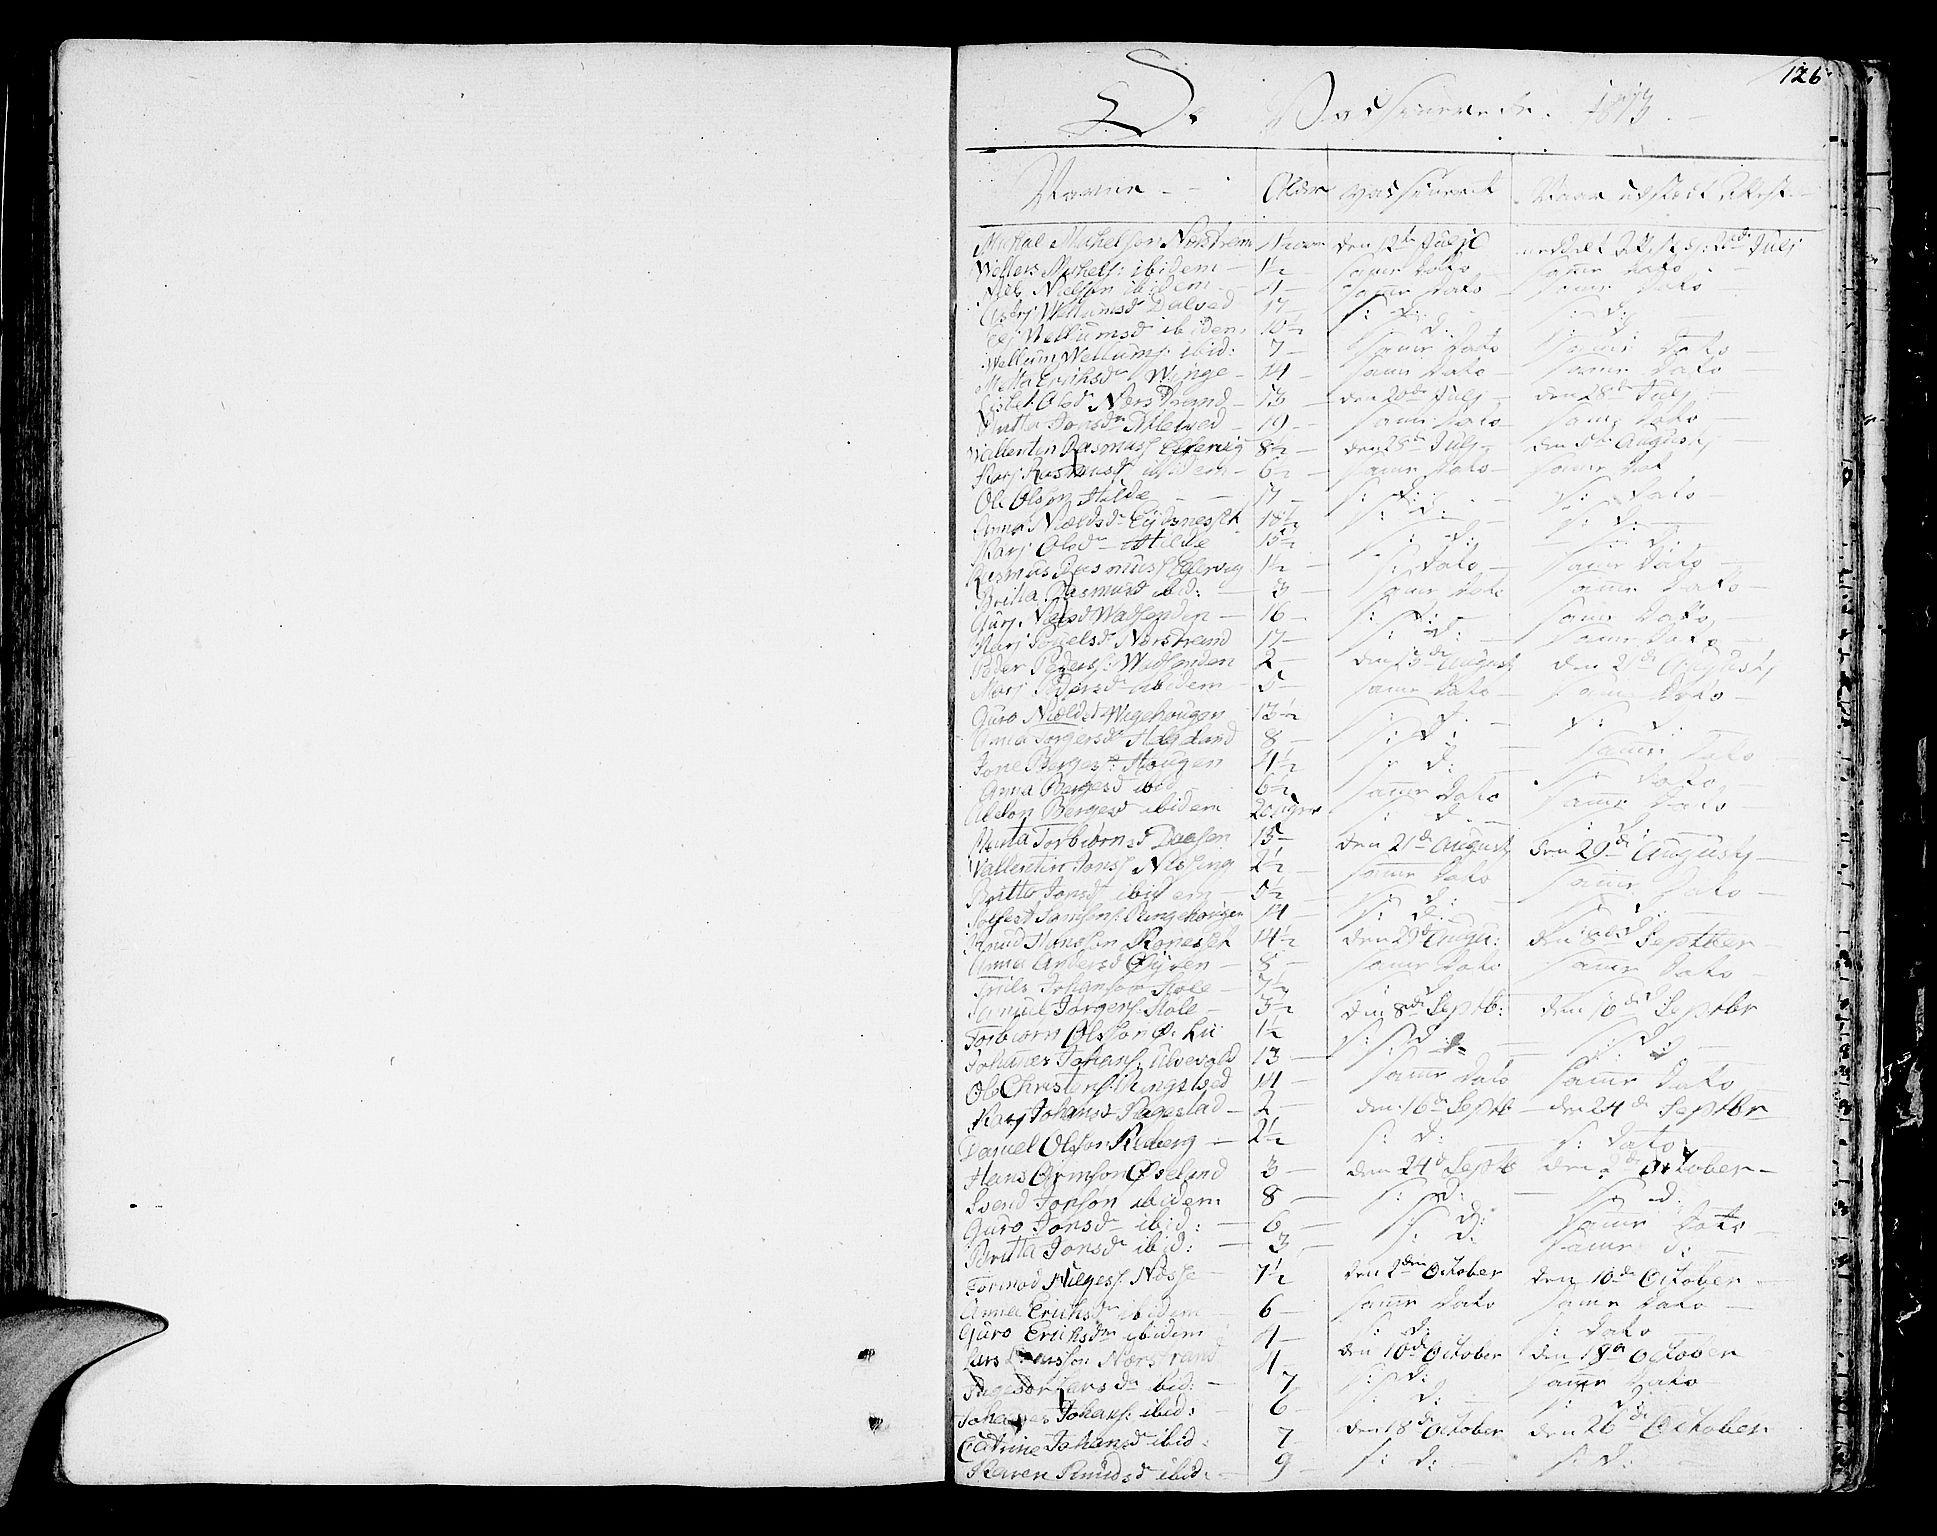 SAST, Nedstrand sokneprestkontor, IV: Ministerialbok nr. A 5, 1795-1816, s. 126